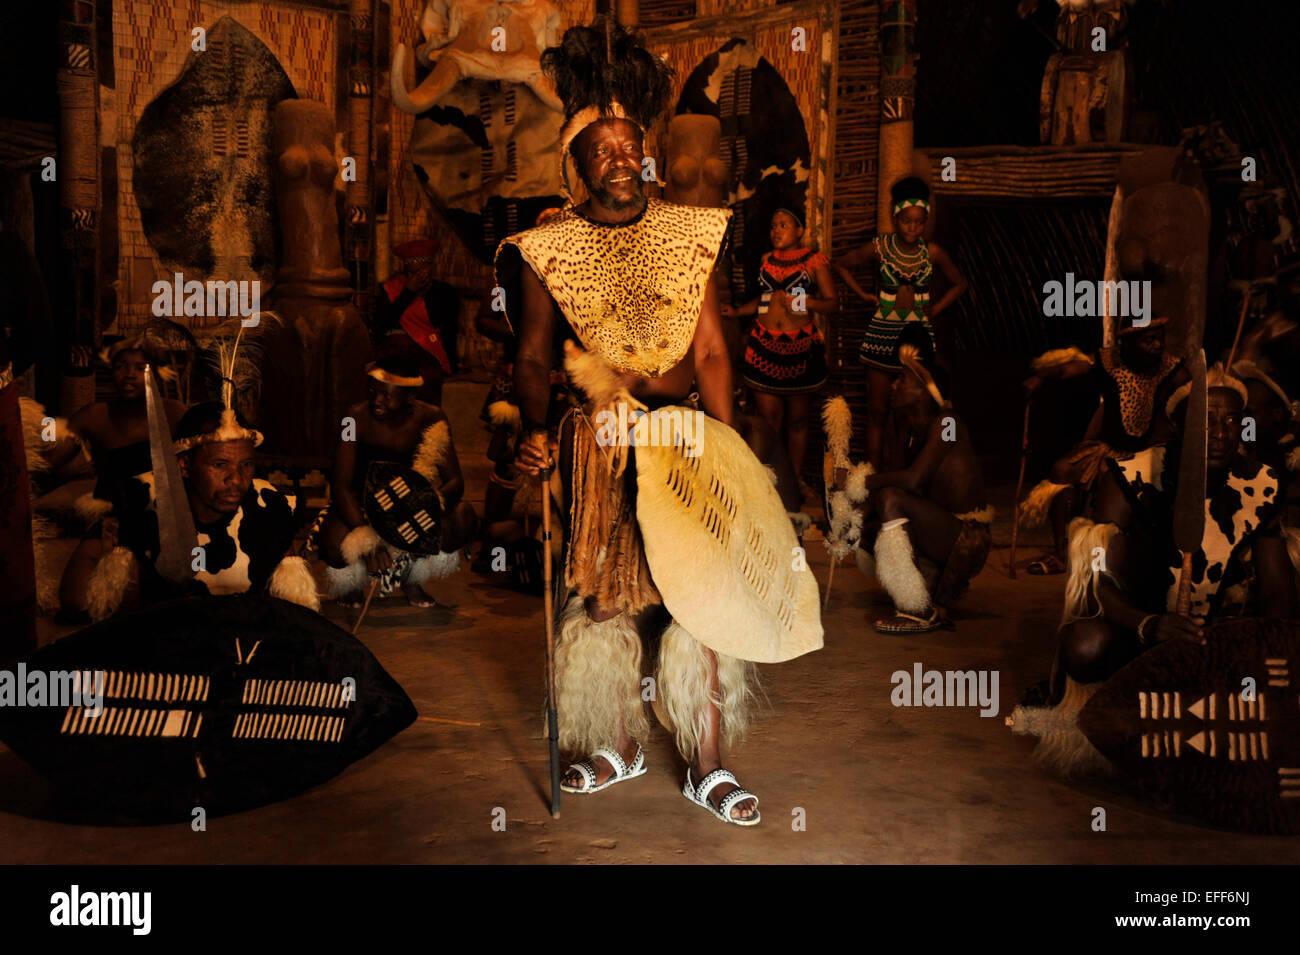 Adult man in traditional dress, Zulu chief with shield, dancers in warrior dress, traditional dance show, Shakaland, KwaZulu-Natal, South Africa Stock Photo